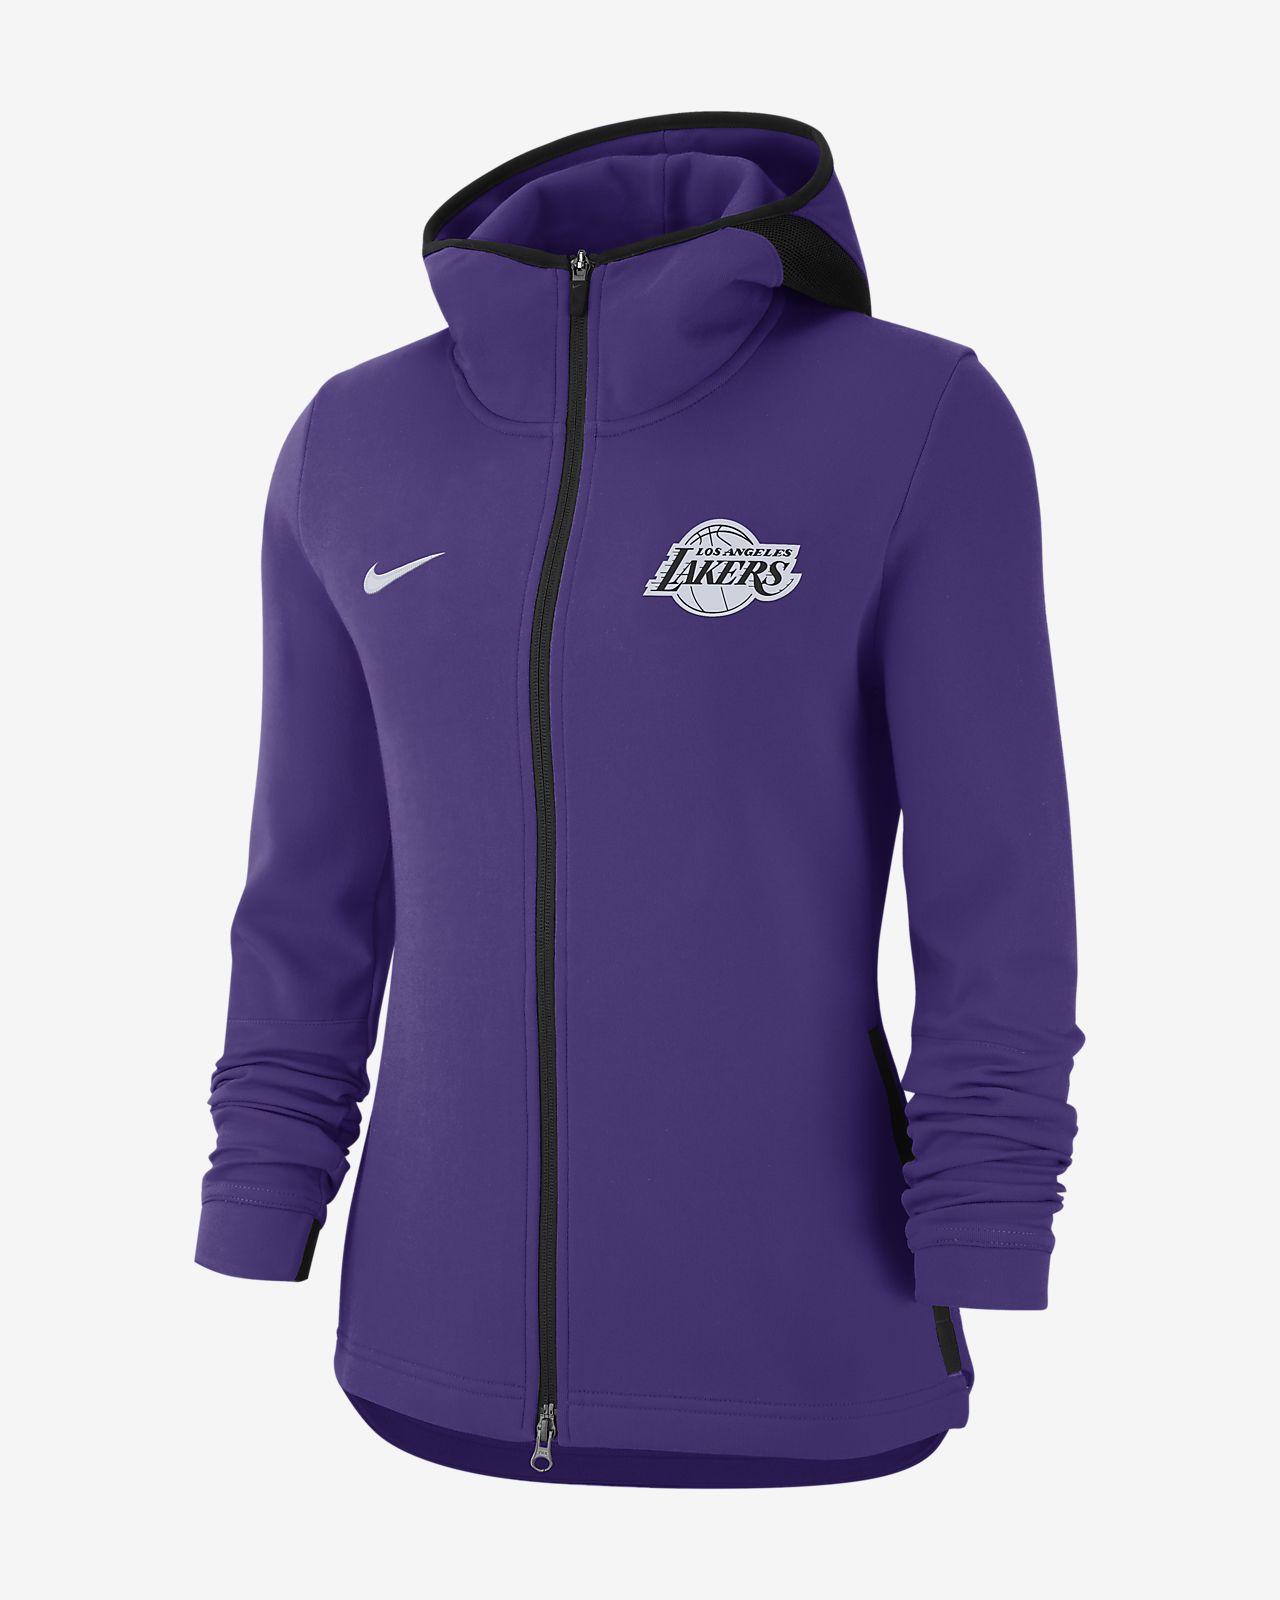 fafc7484a8a5 Los Angeles Lakers Nike Dri-FIT Showtime Women s NBA Hoodie. Nike.com